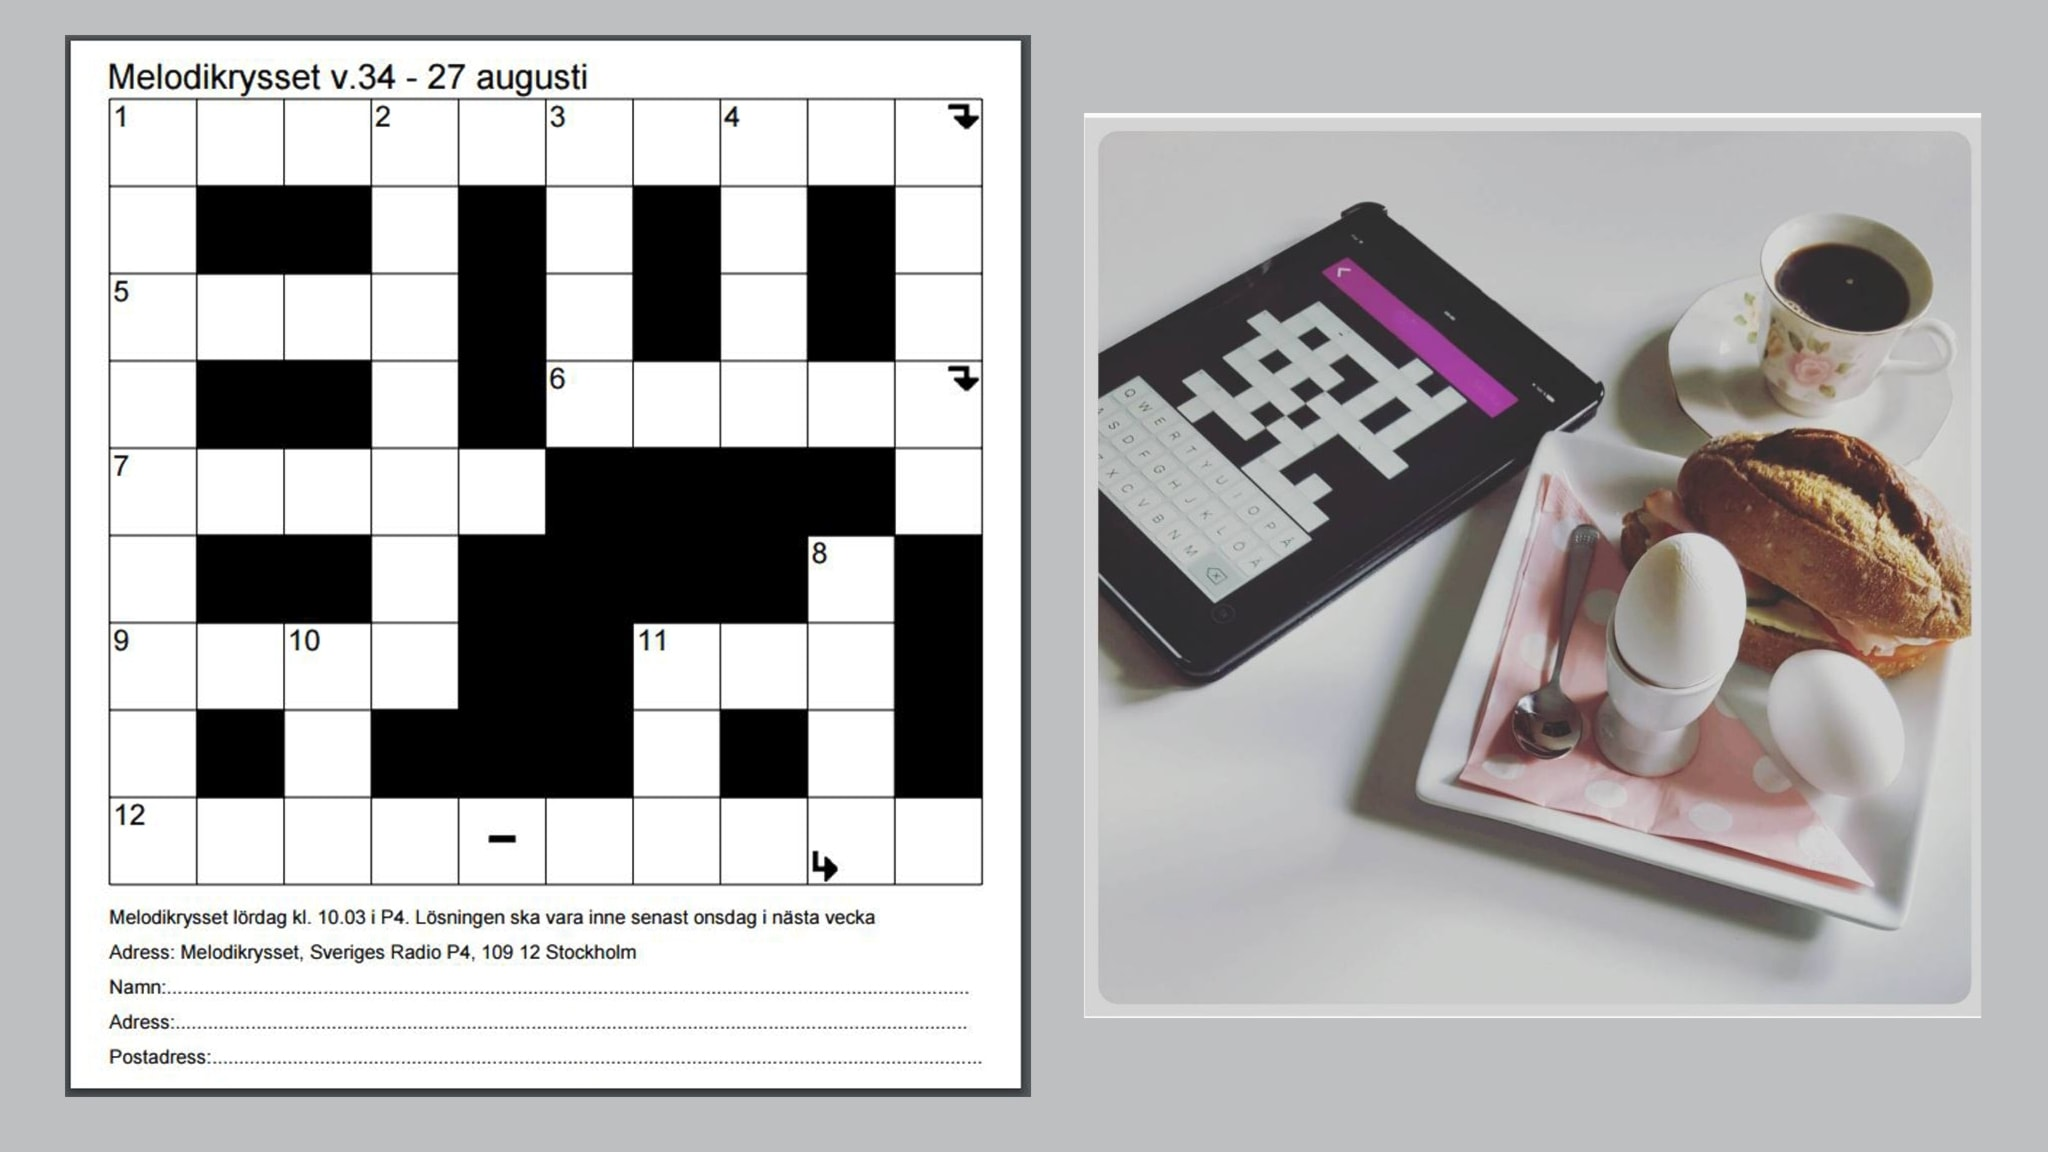 Melodikrysset vecka 34 - 27 augusti - spela